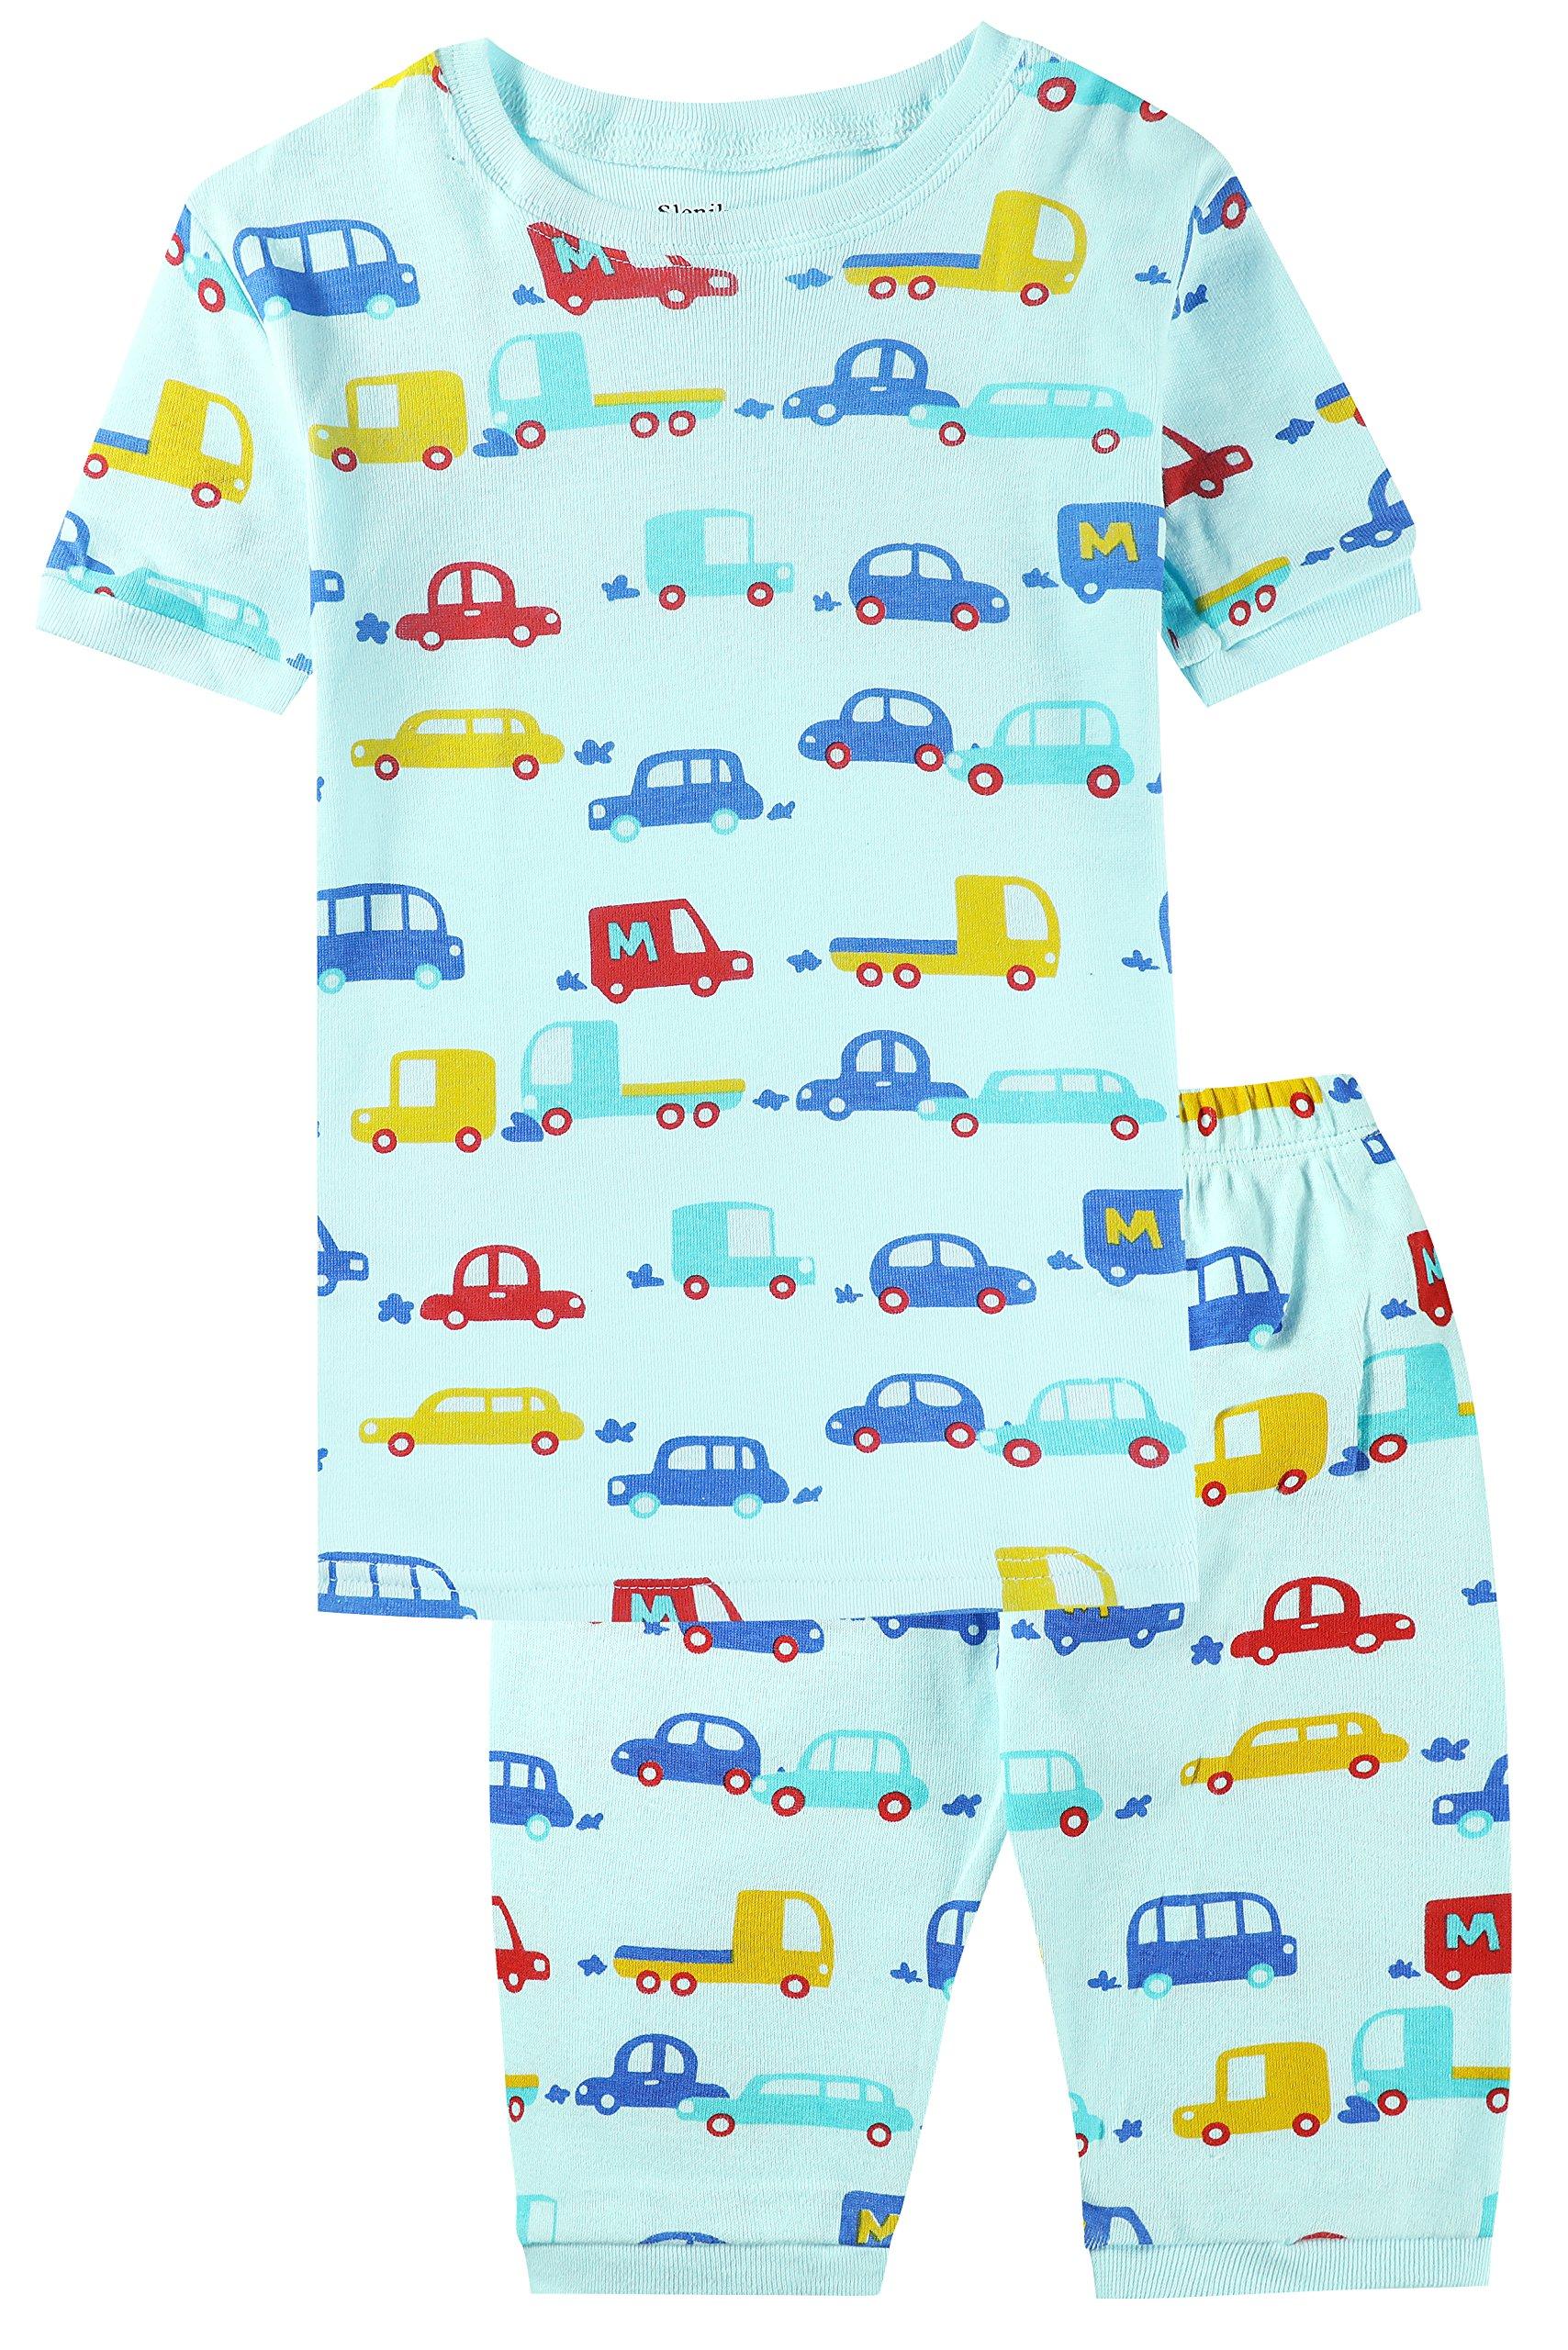 Slenily Boys Pajamas Little Kid Shorts Set 100% Cotton Sleepwear Toddler PJS Size 6